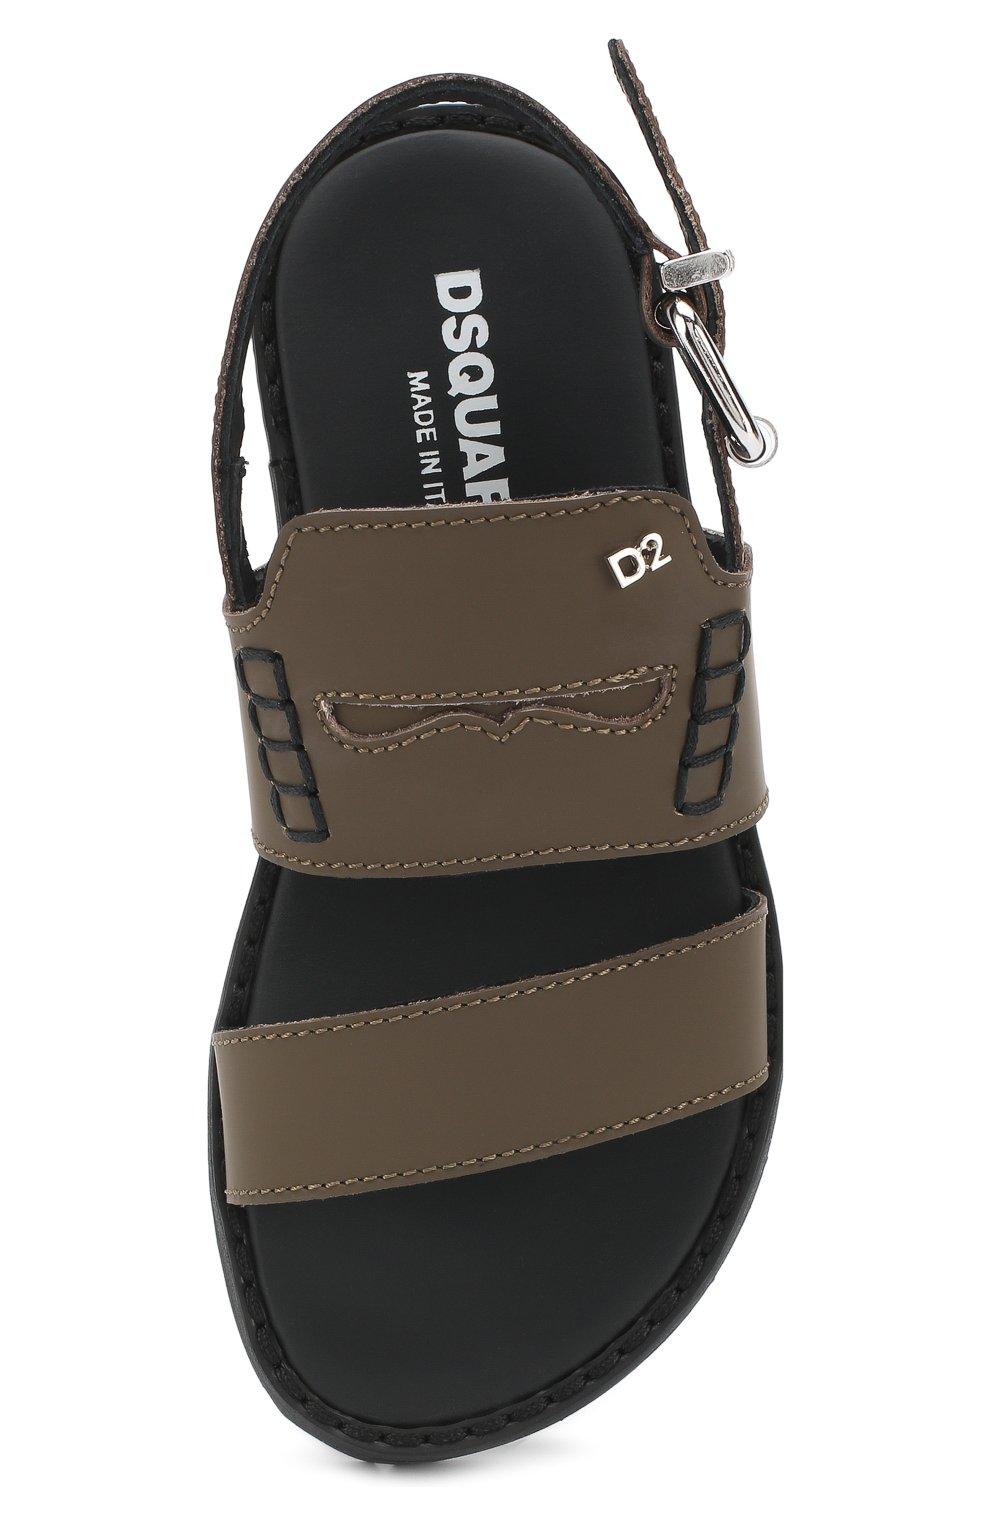 Детские кожаные сандалии на ремешке DSQUARED2 хаки цвета, арт. 54194/28-35   Фото 4